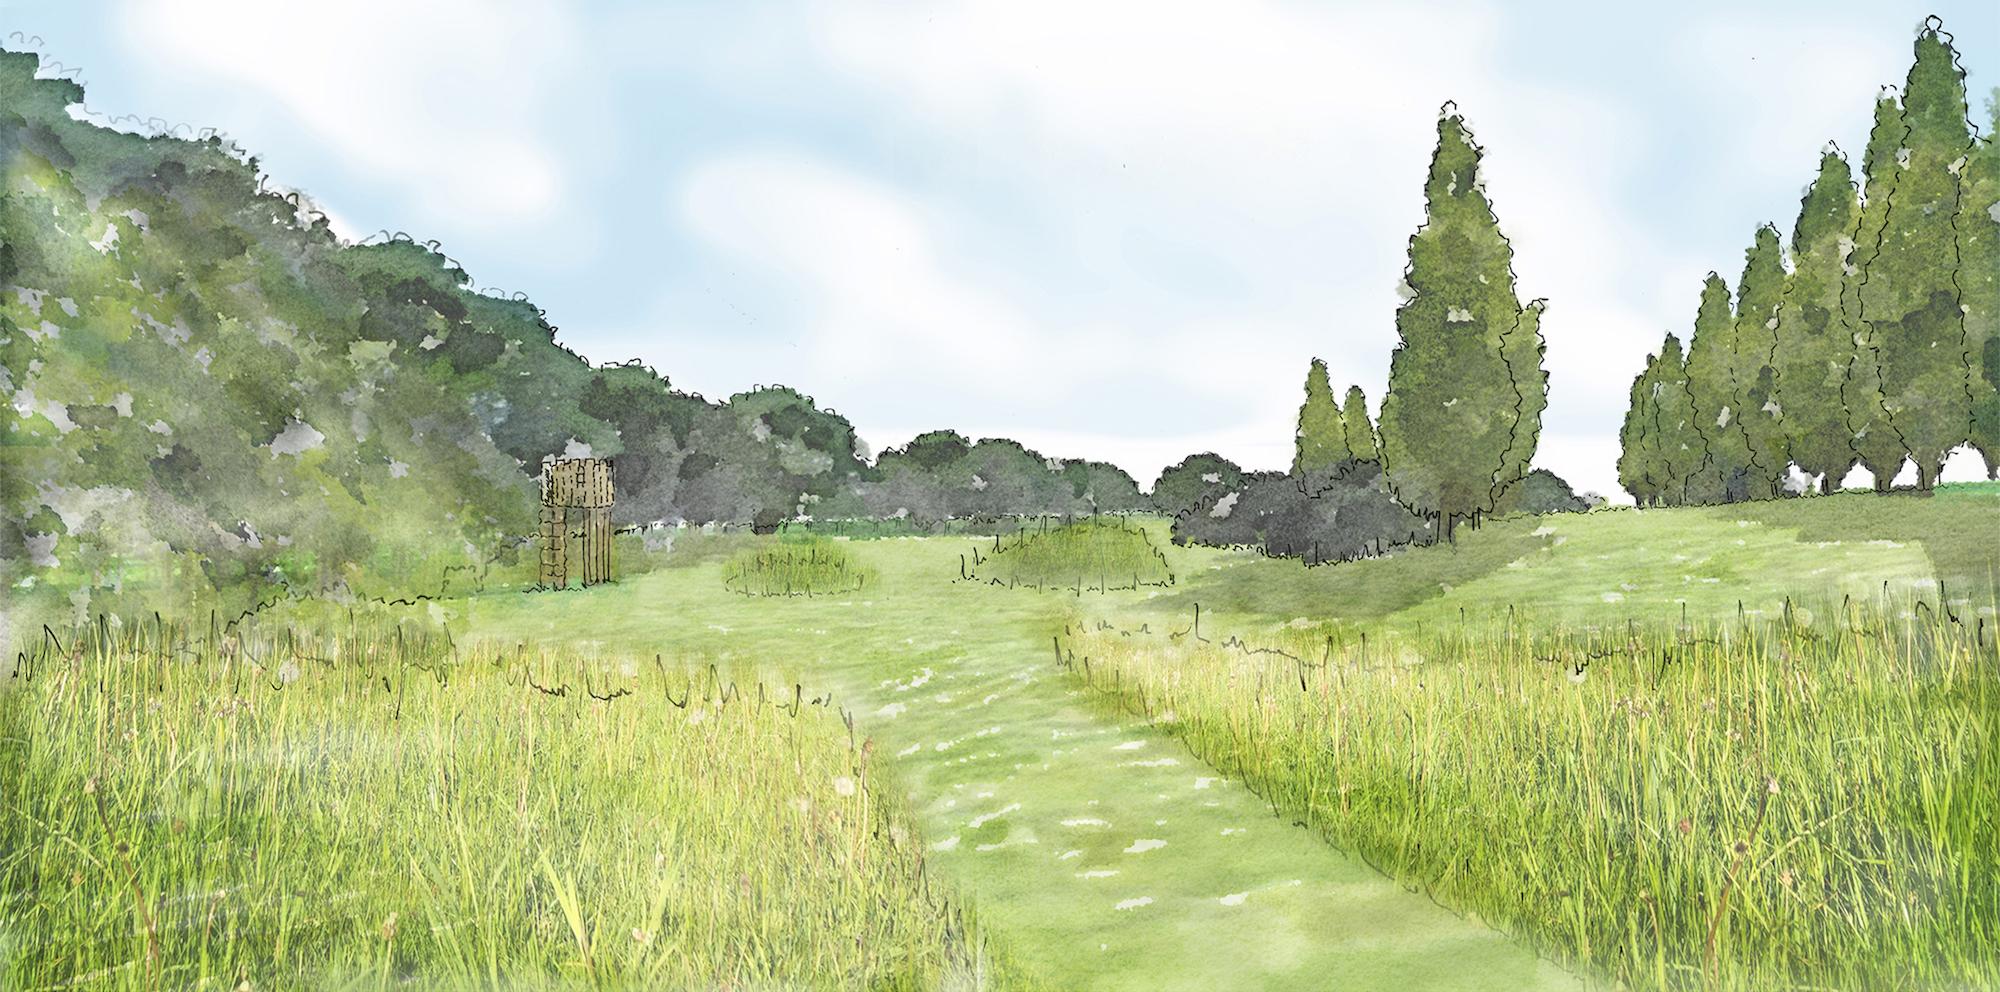 Grass meadow.jpg